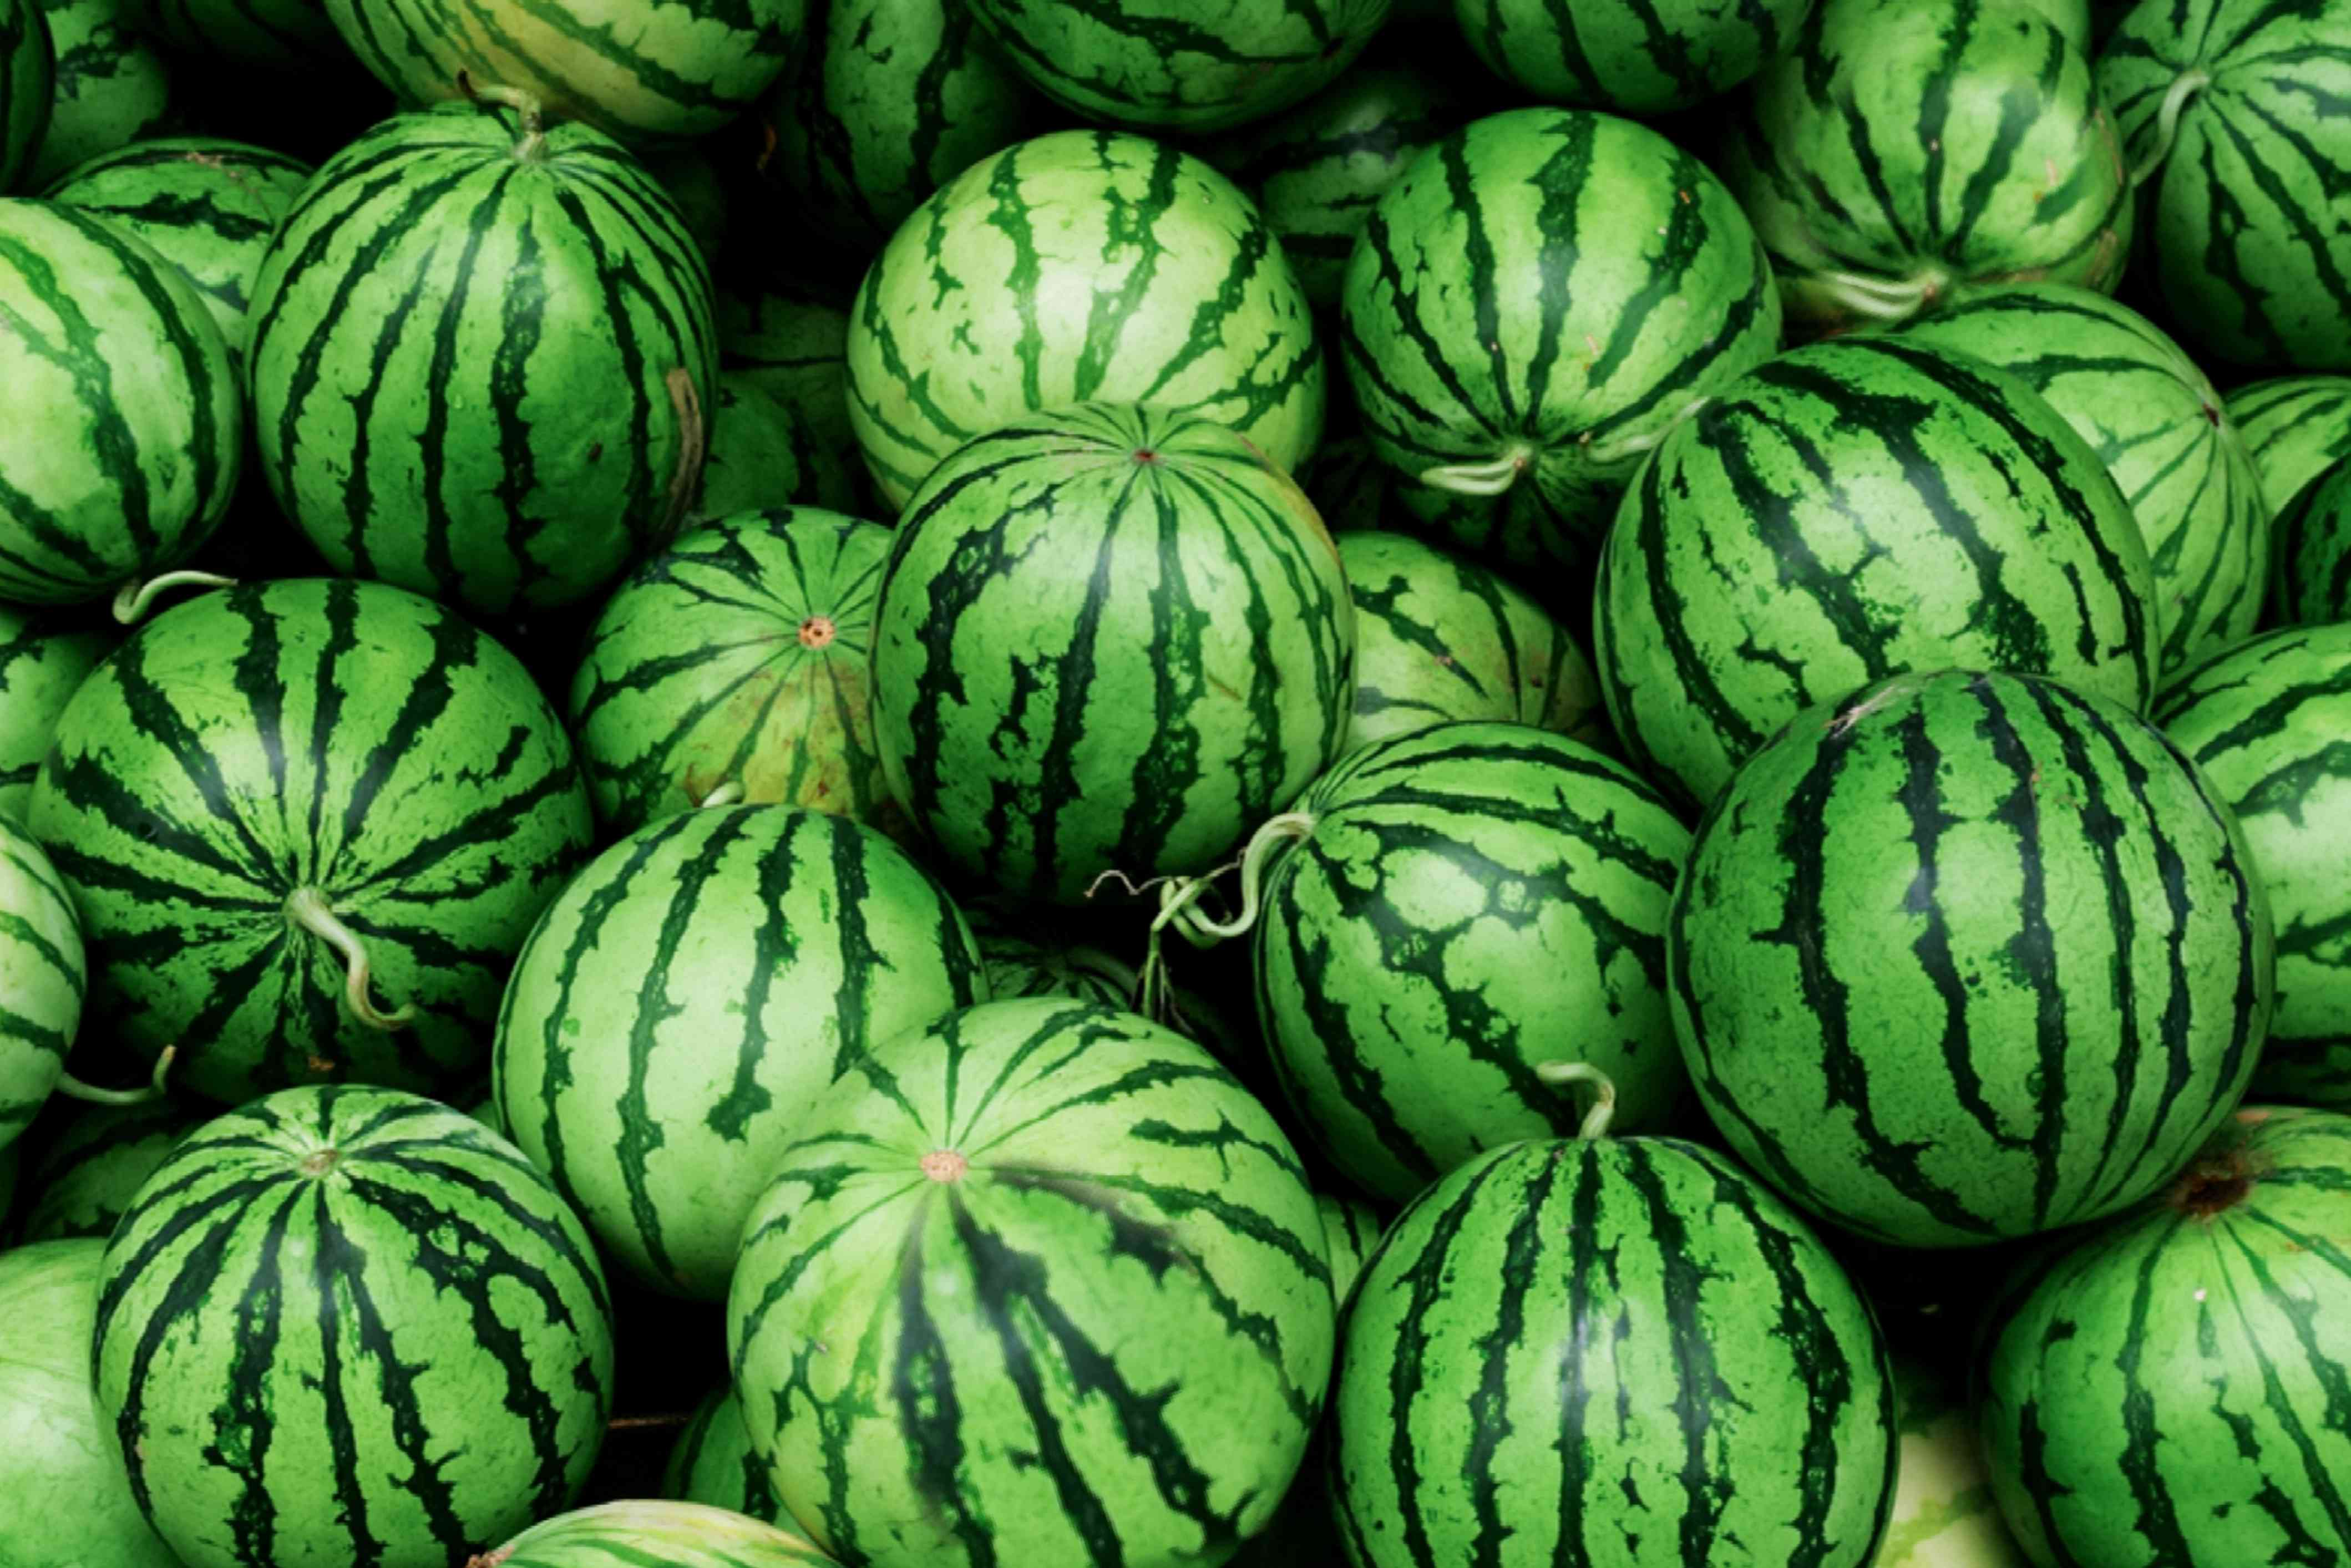 A pile of whole watermelon fruit